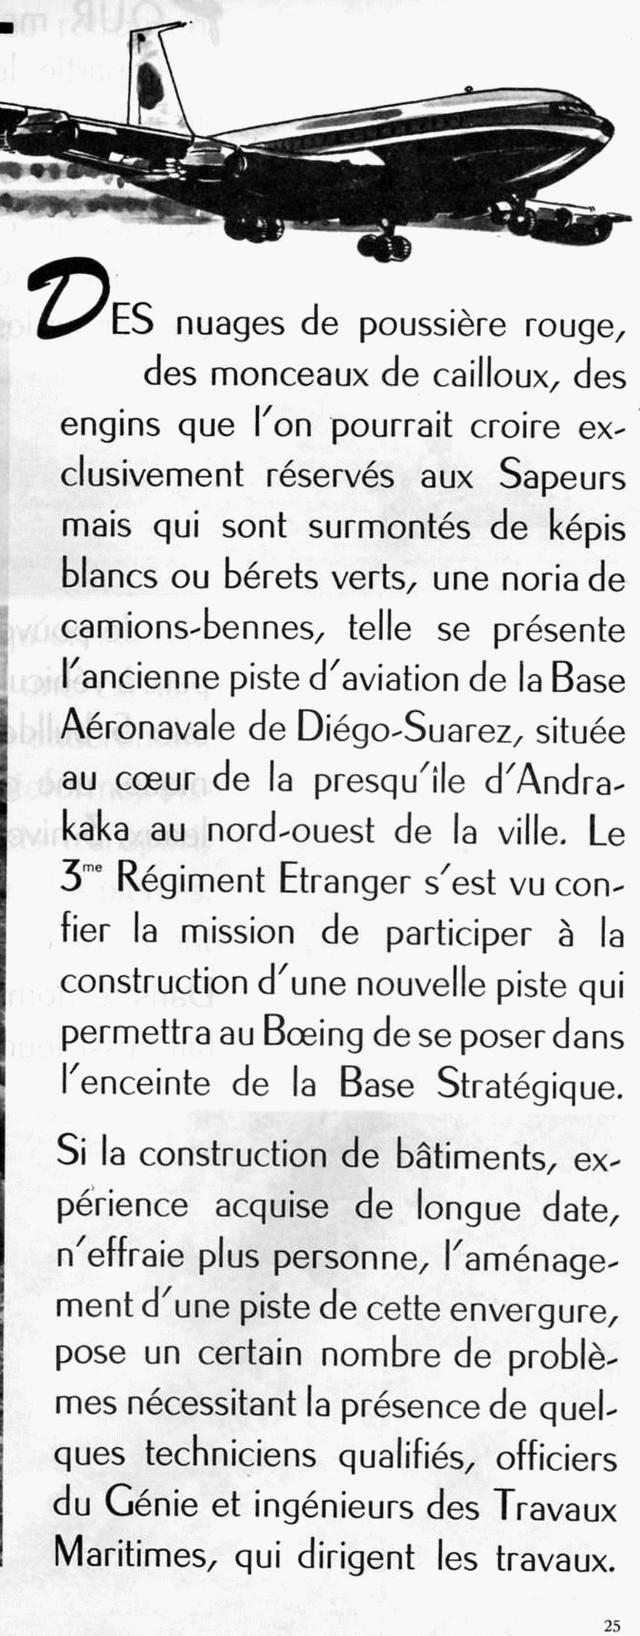 [LES B.A.N.] DIEGO-SUAREZ - ANDRAKAKA - Page 11 Andrak17